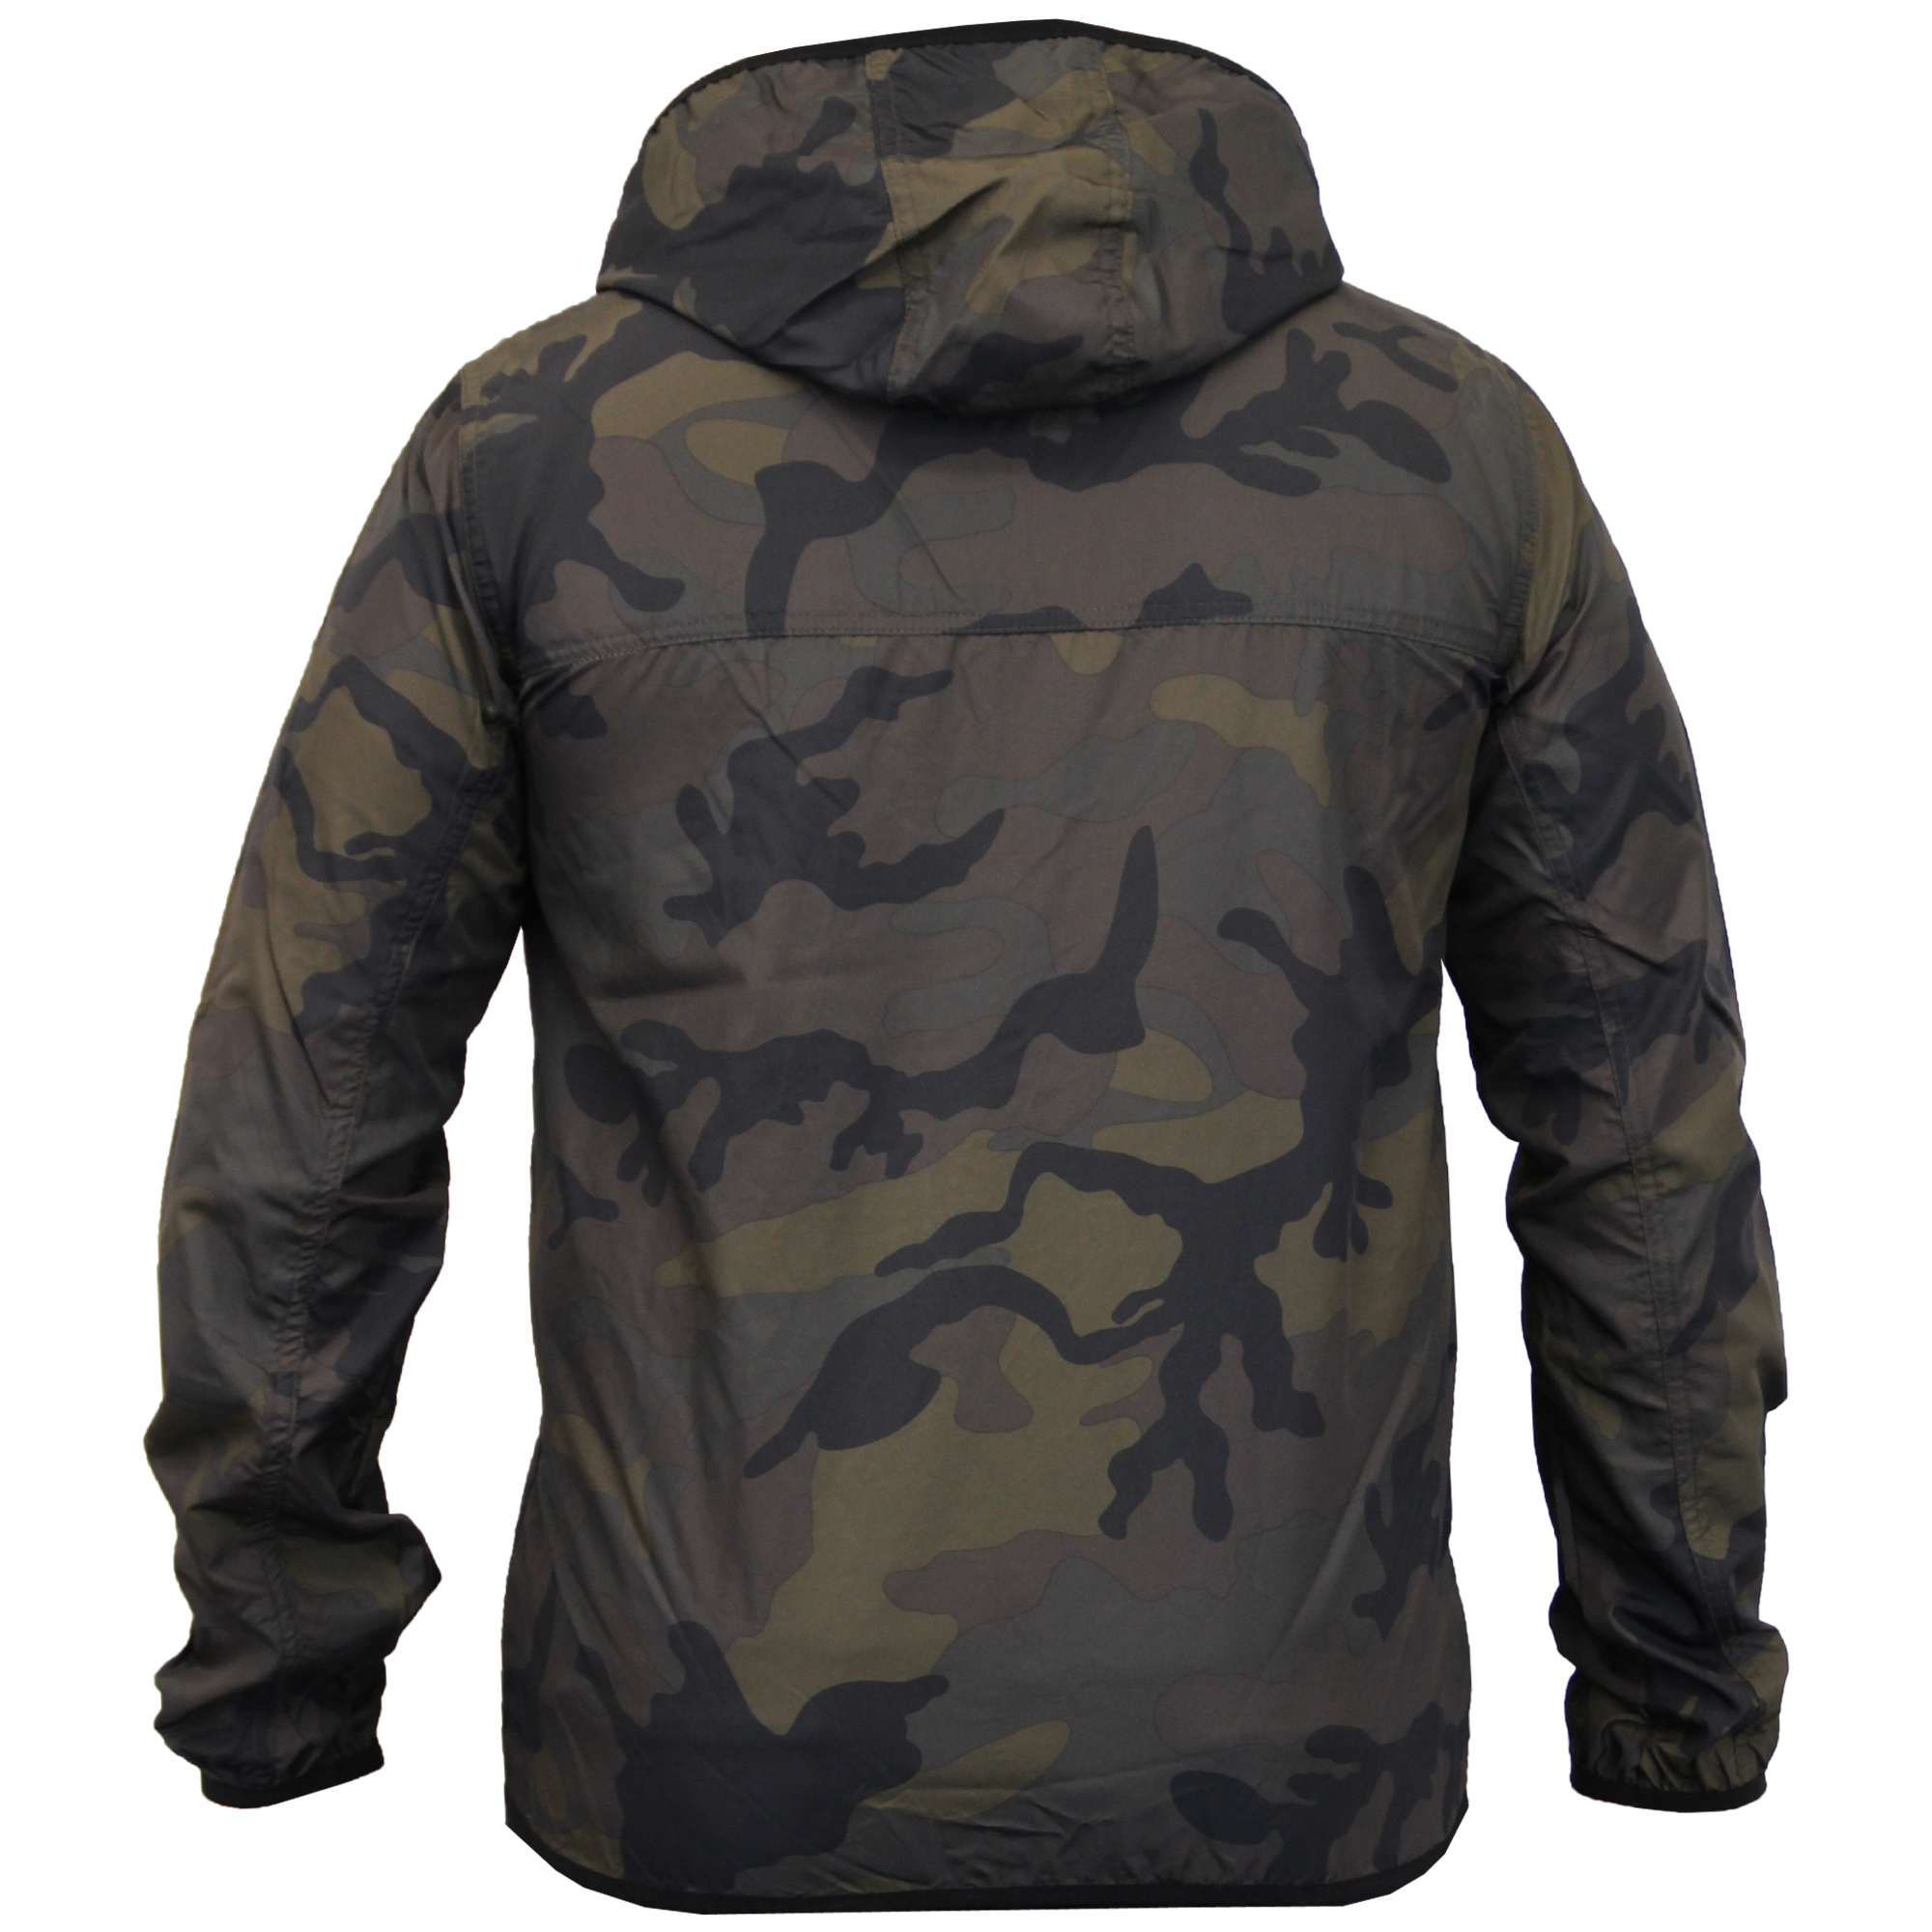 mens camouflage jacket brave soul kagool coat military hooded cagoule mesh new ebay. Black Bedroom Furniture Sets. Home Design Ideas